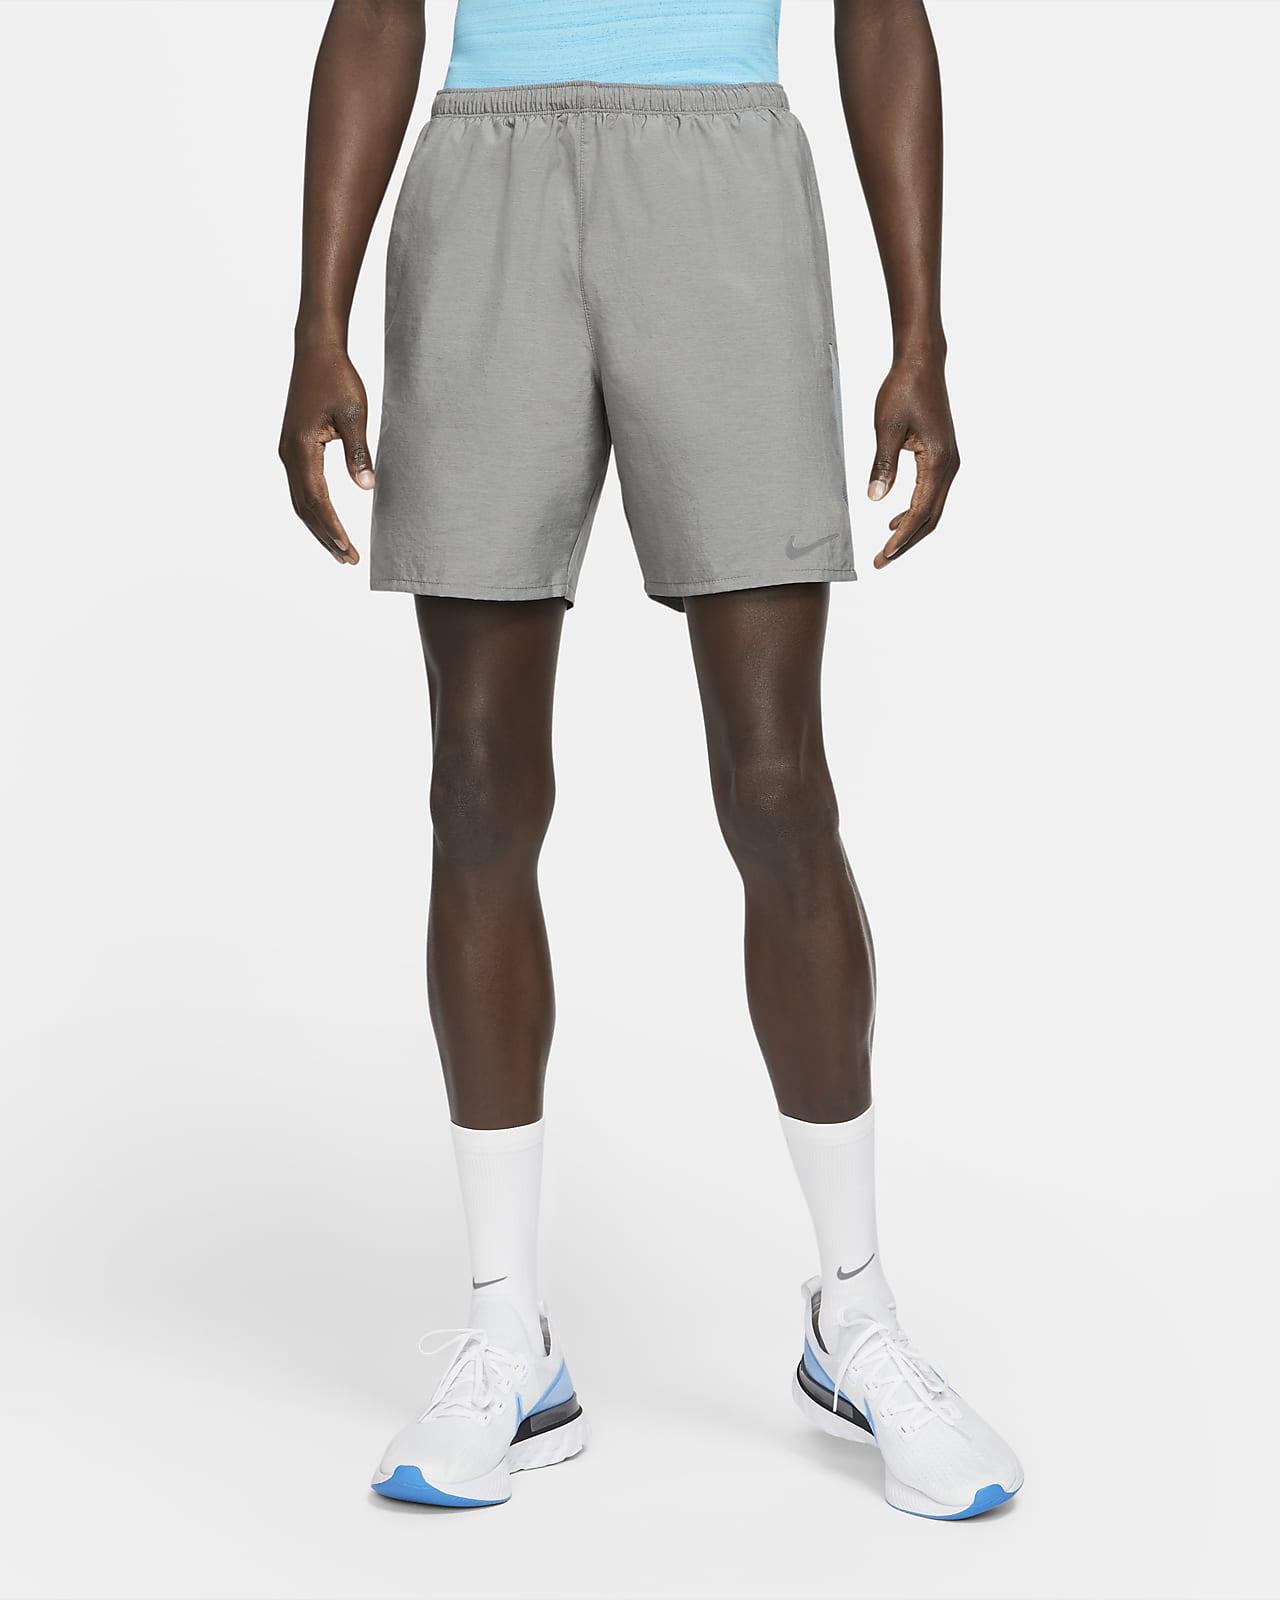 Shorts de running 2 en 1 para hombre Nike Challenger